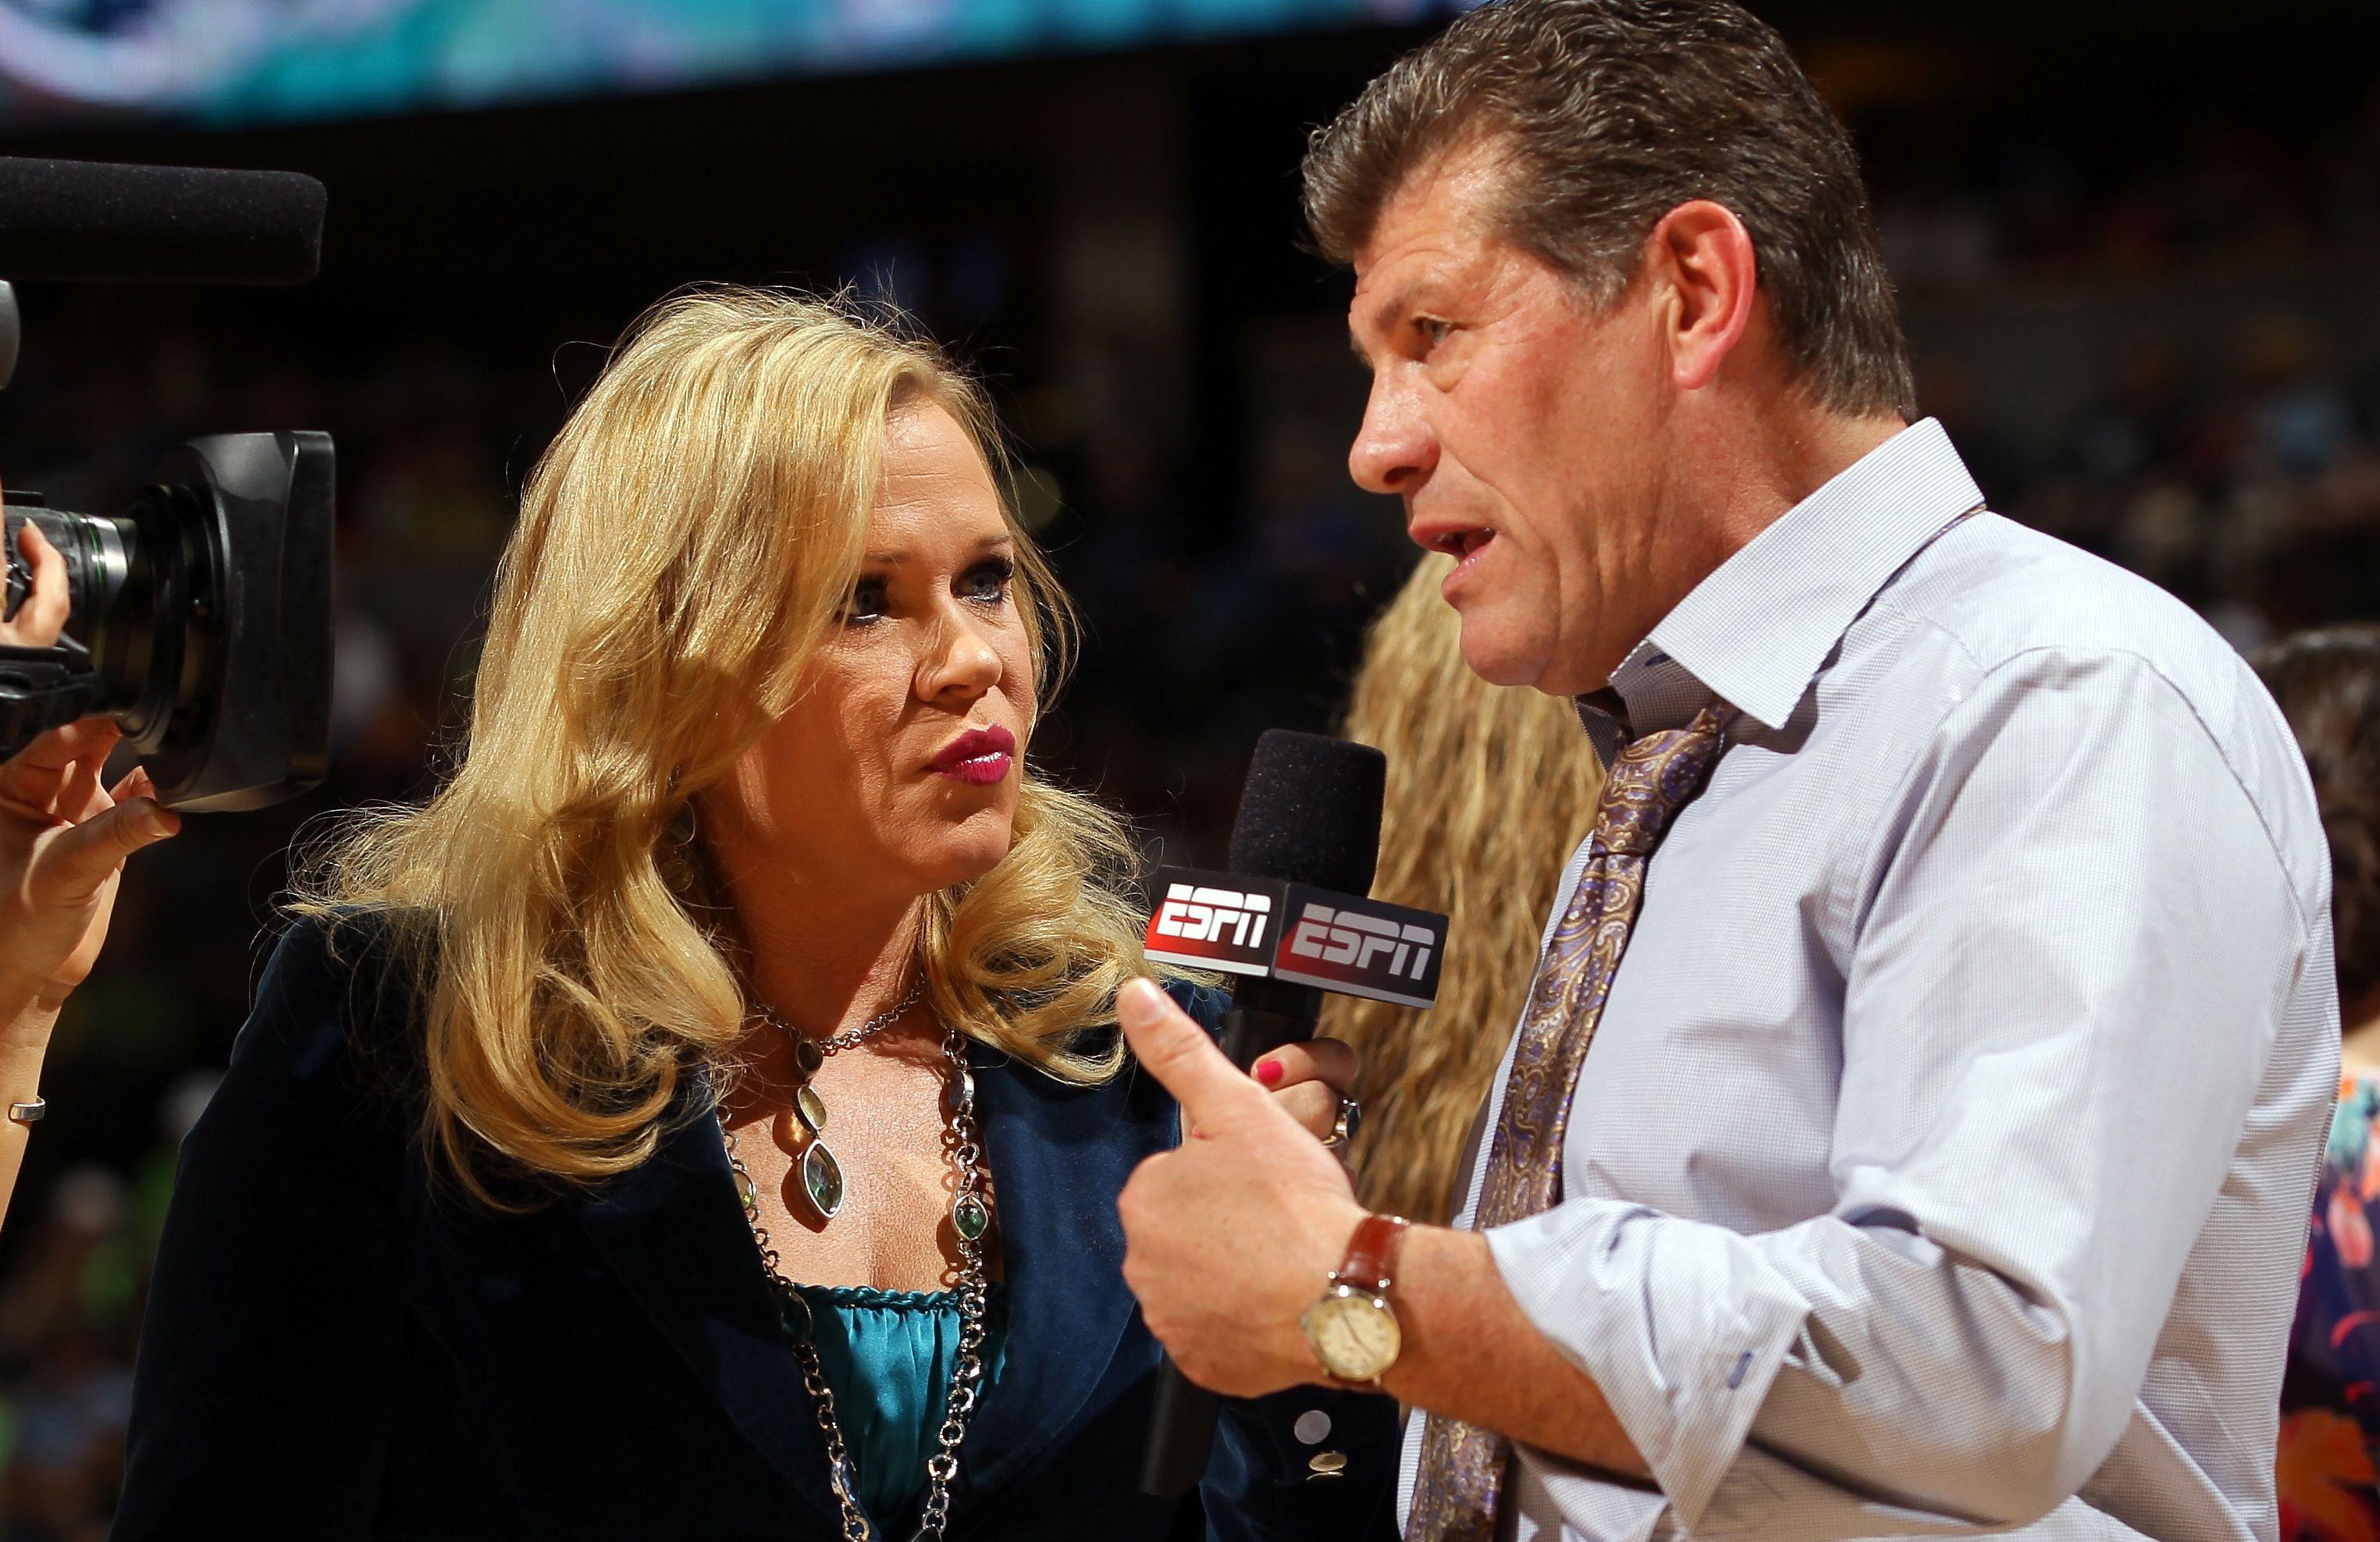 Interview tips via Poynter from ESPN's guru, John Sawatsky